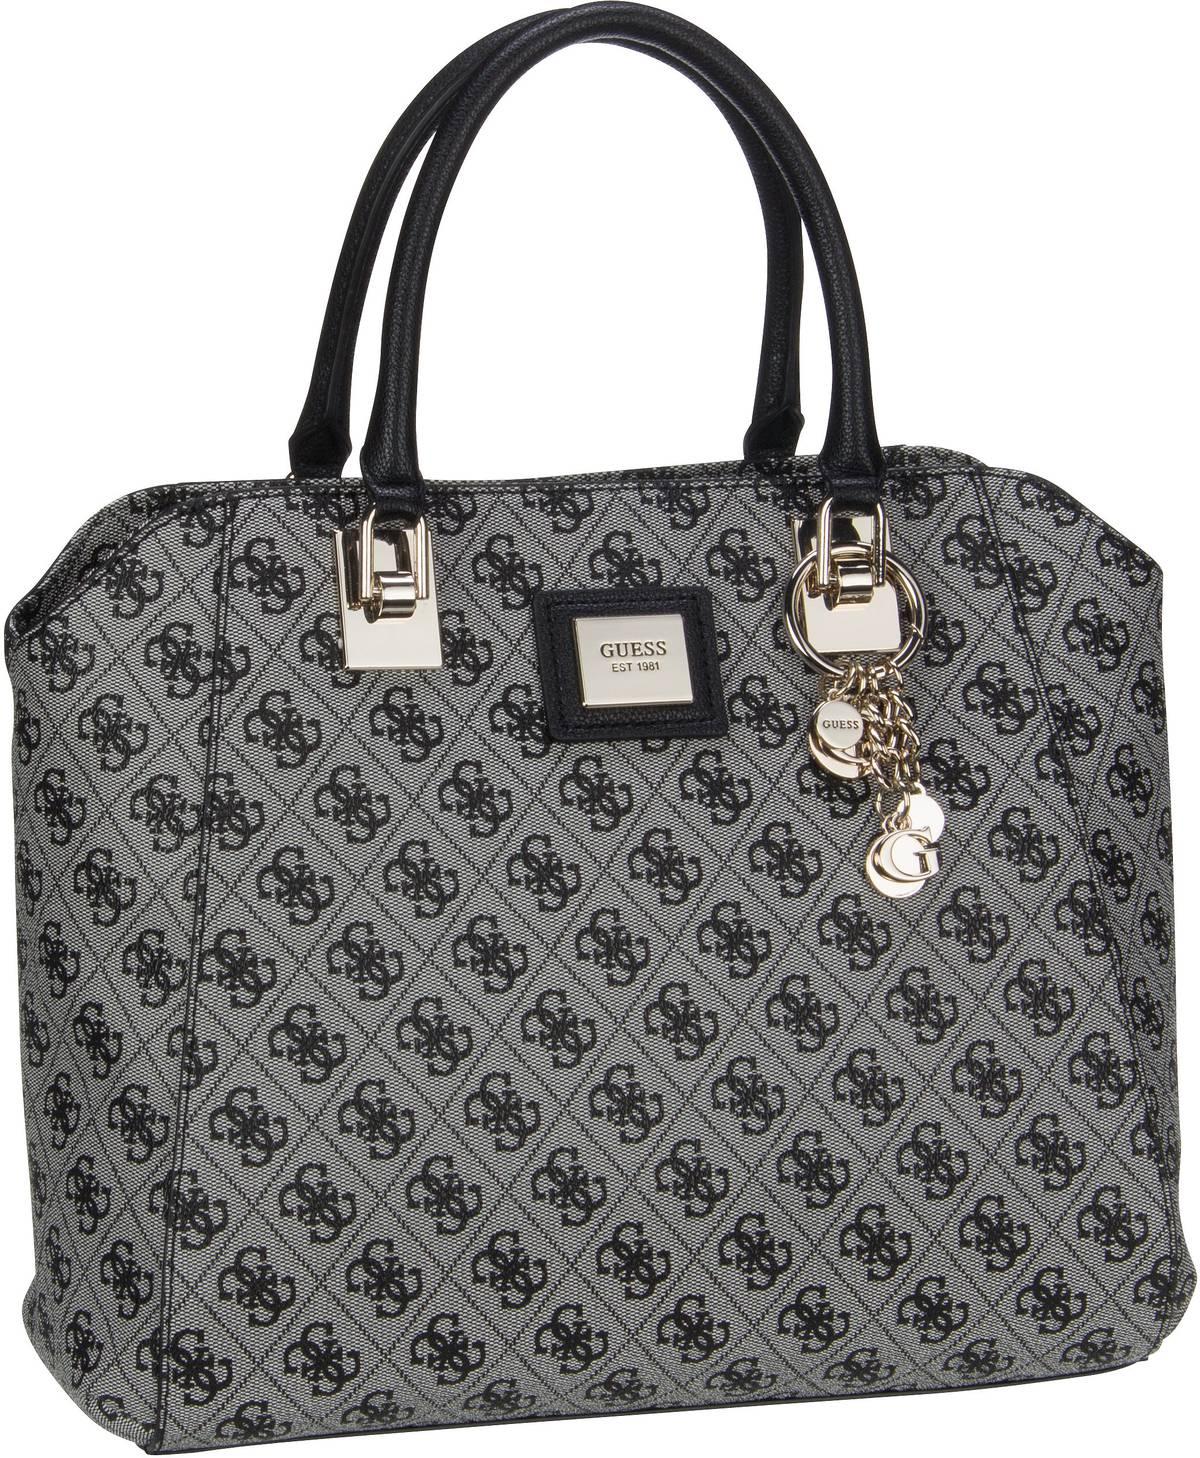 Handtasche Candace Elite Carryall Black